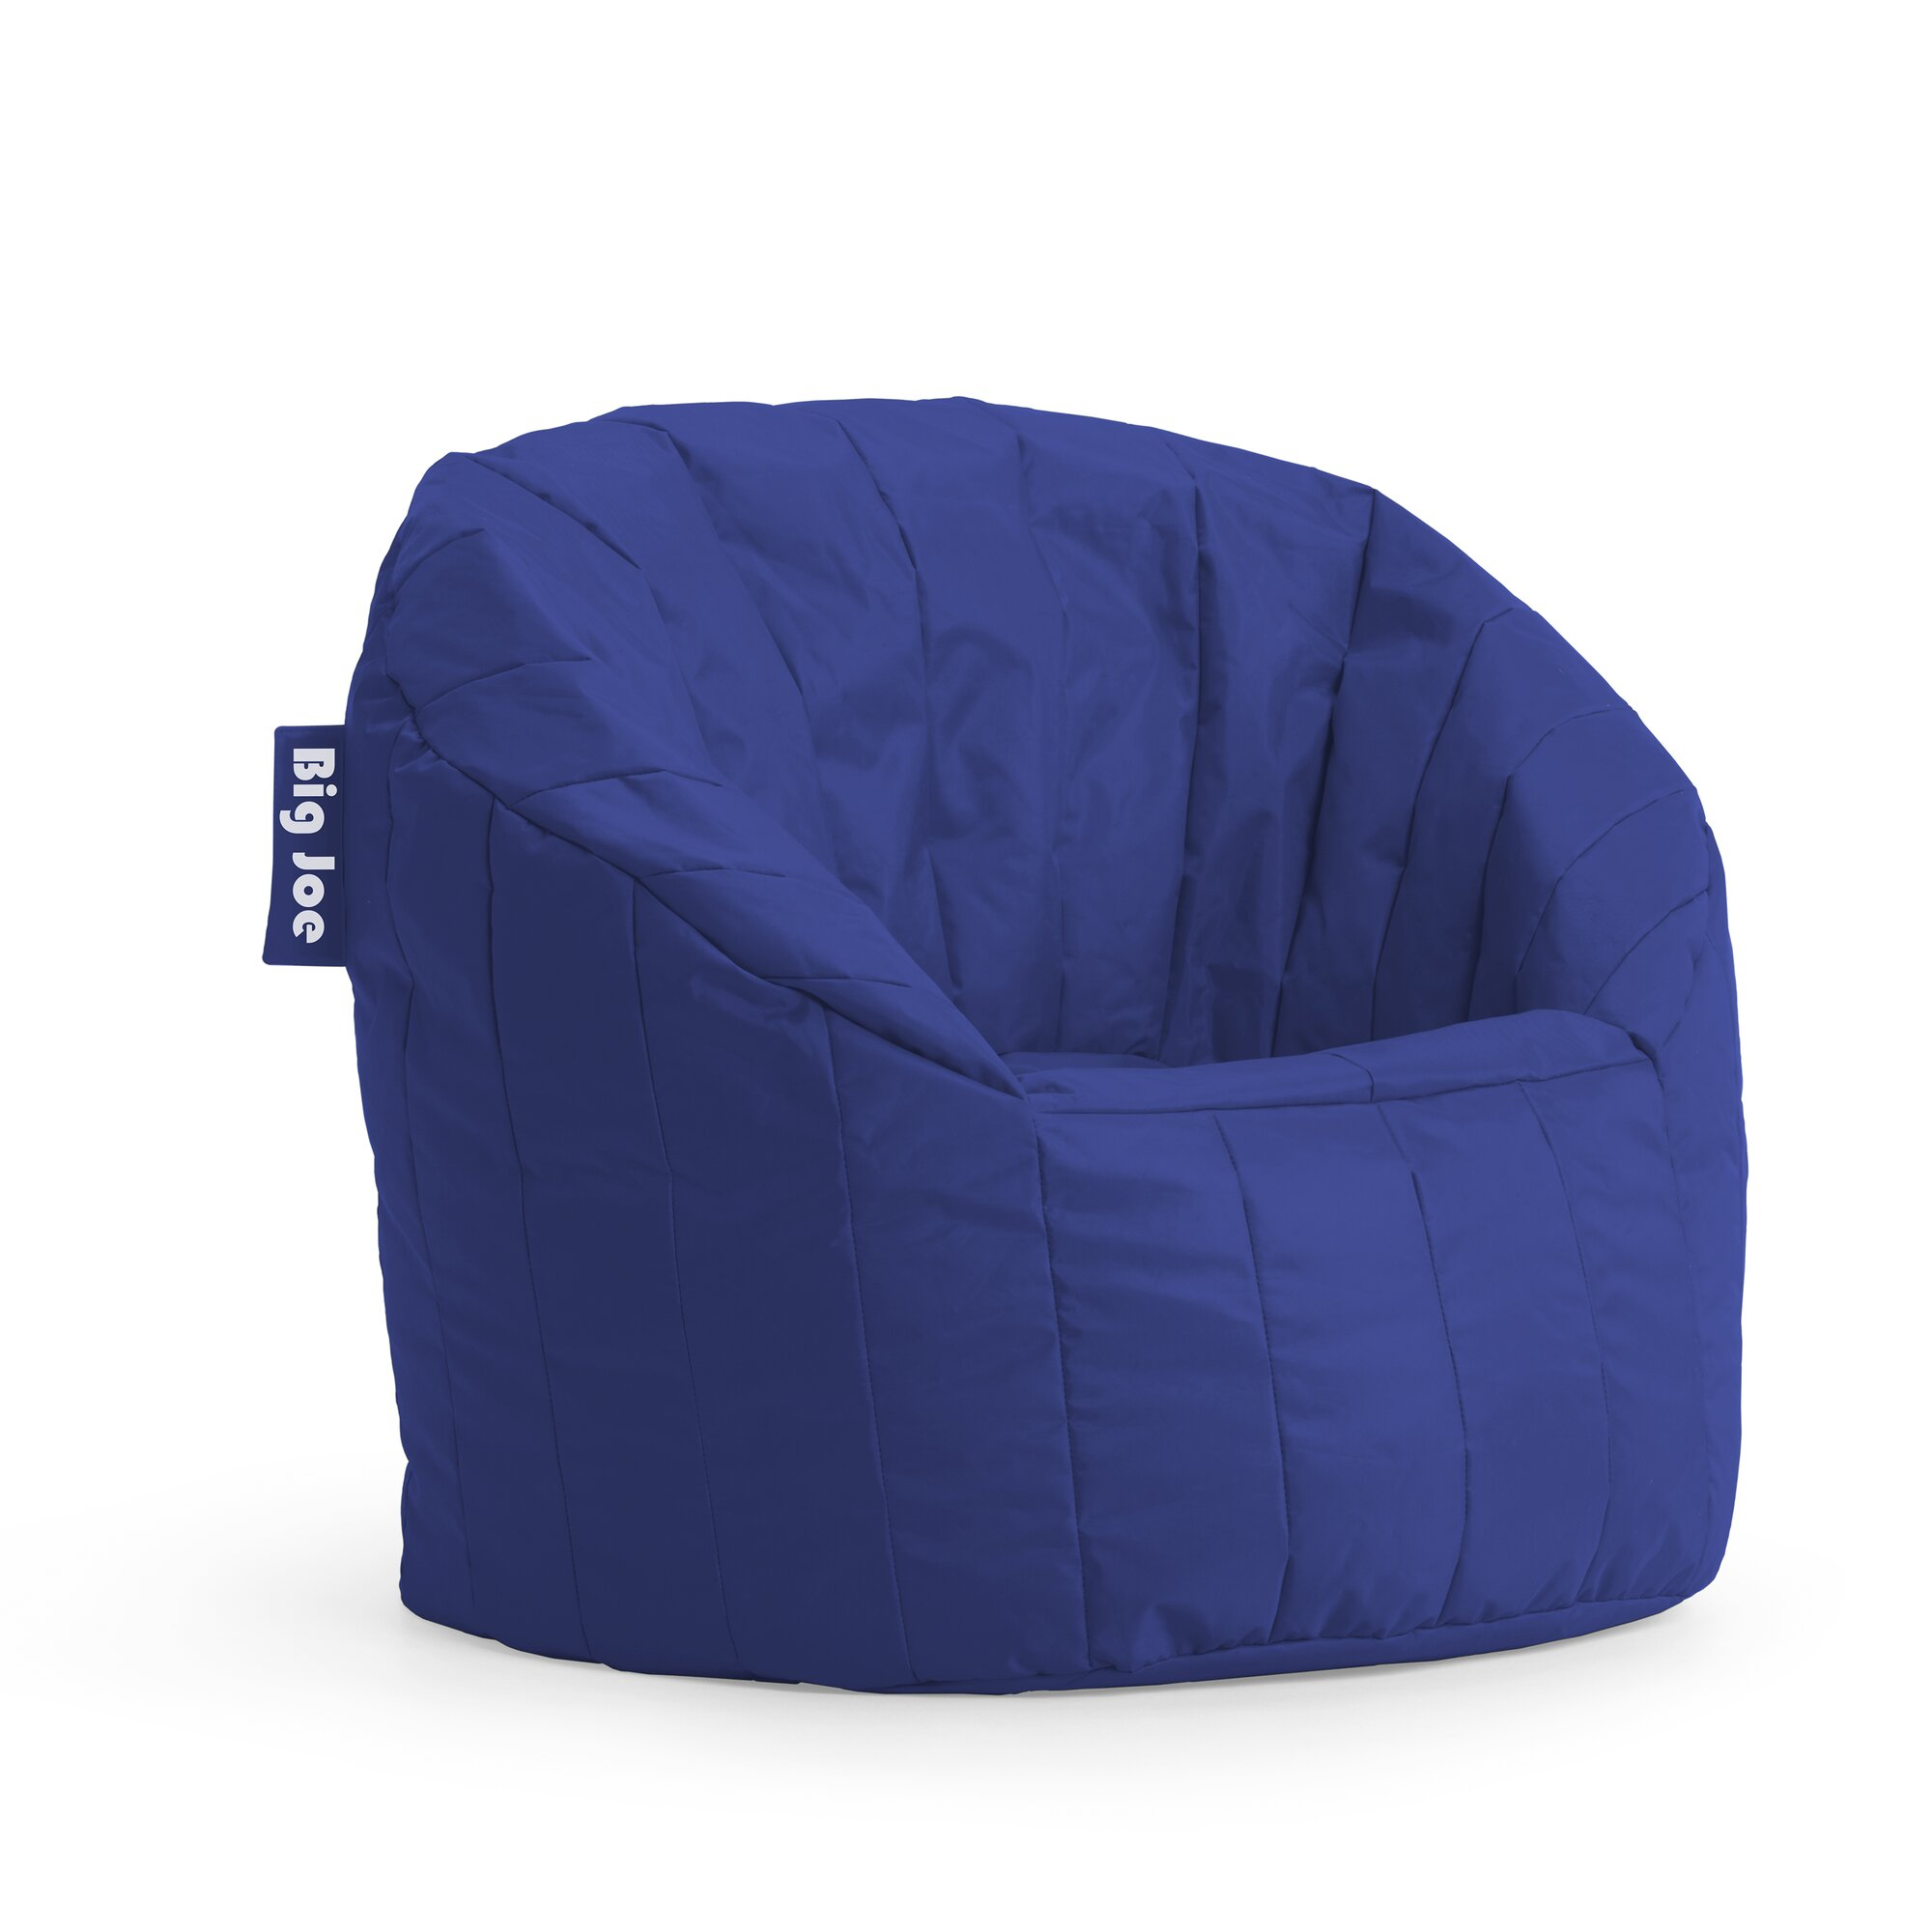 Big joe lumin chair - Big Joe Lumin Chair Comfort Research Big Joe Bean Bag Chair Amp Reviews Wayfair